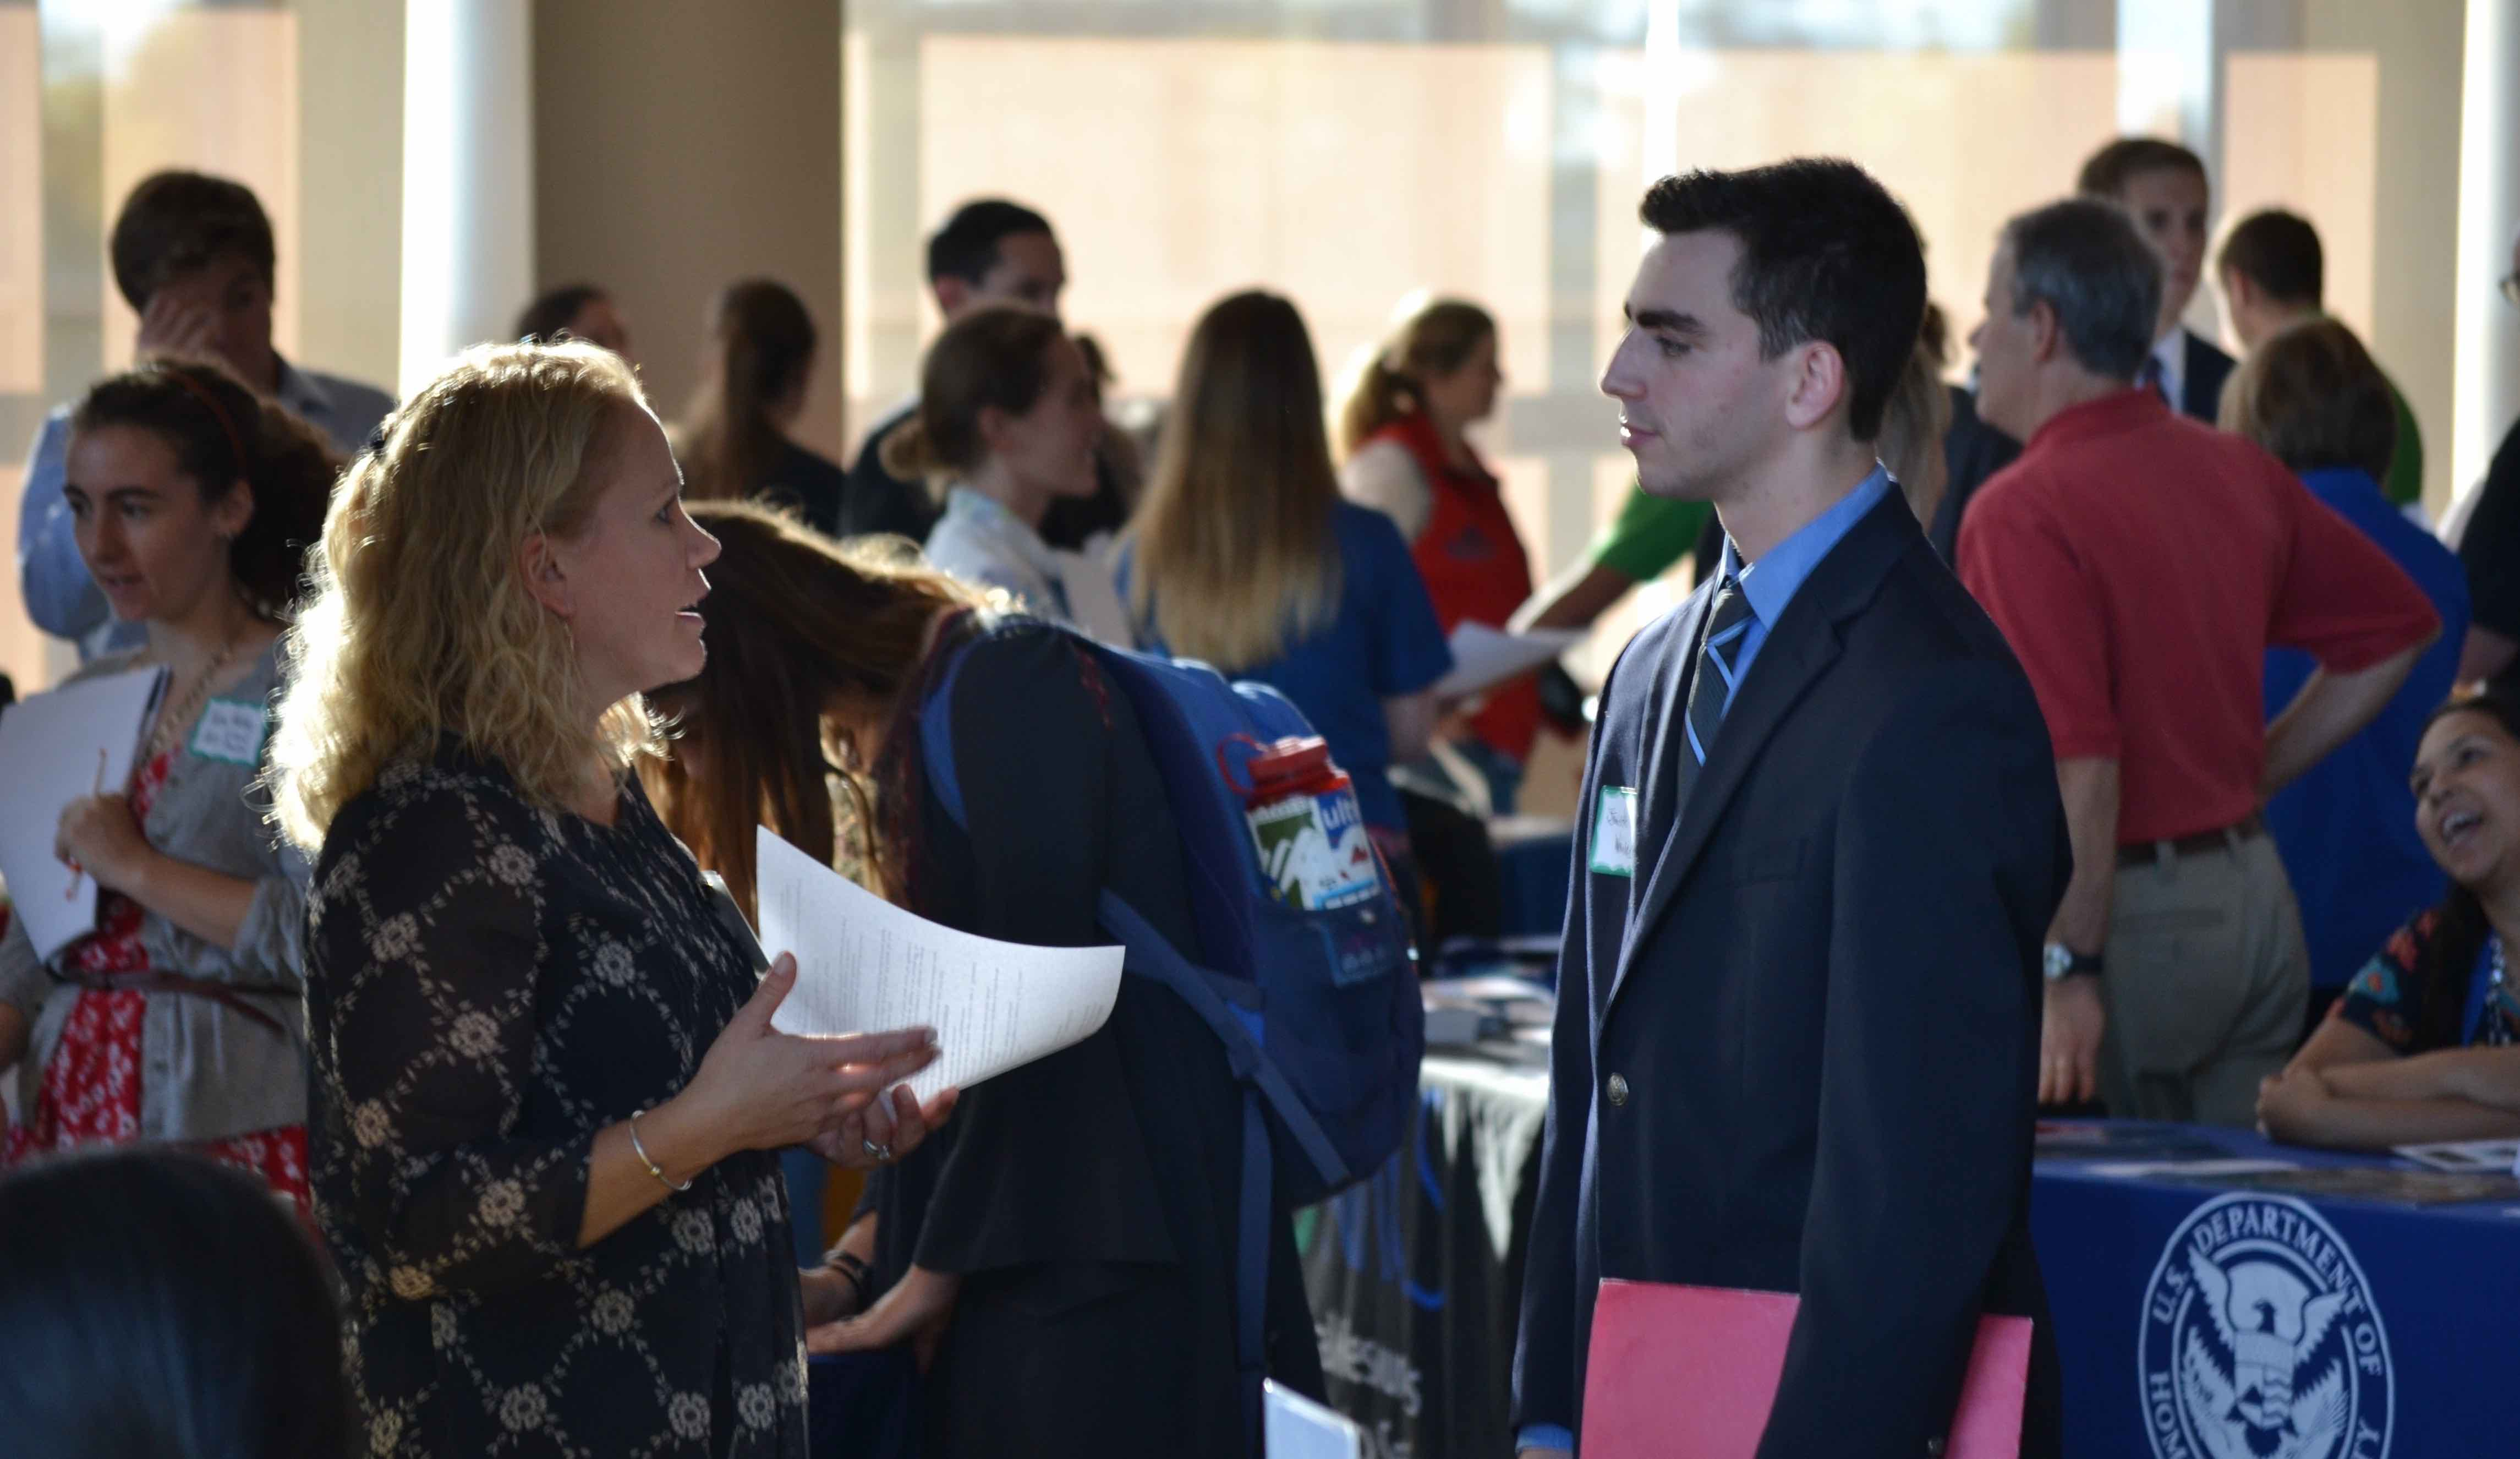 University of Vermont employer partners